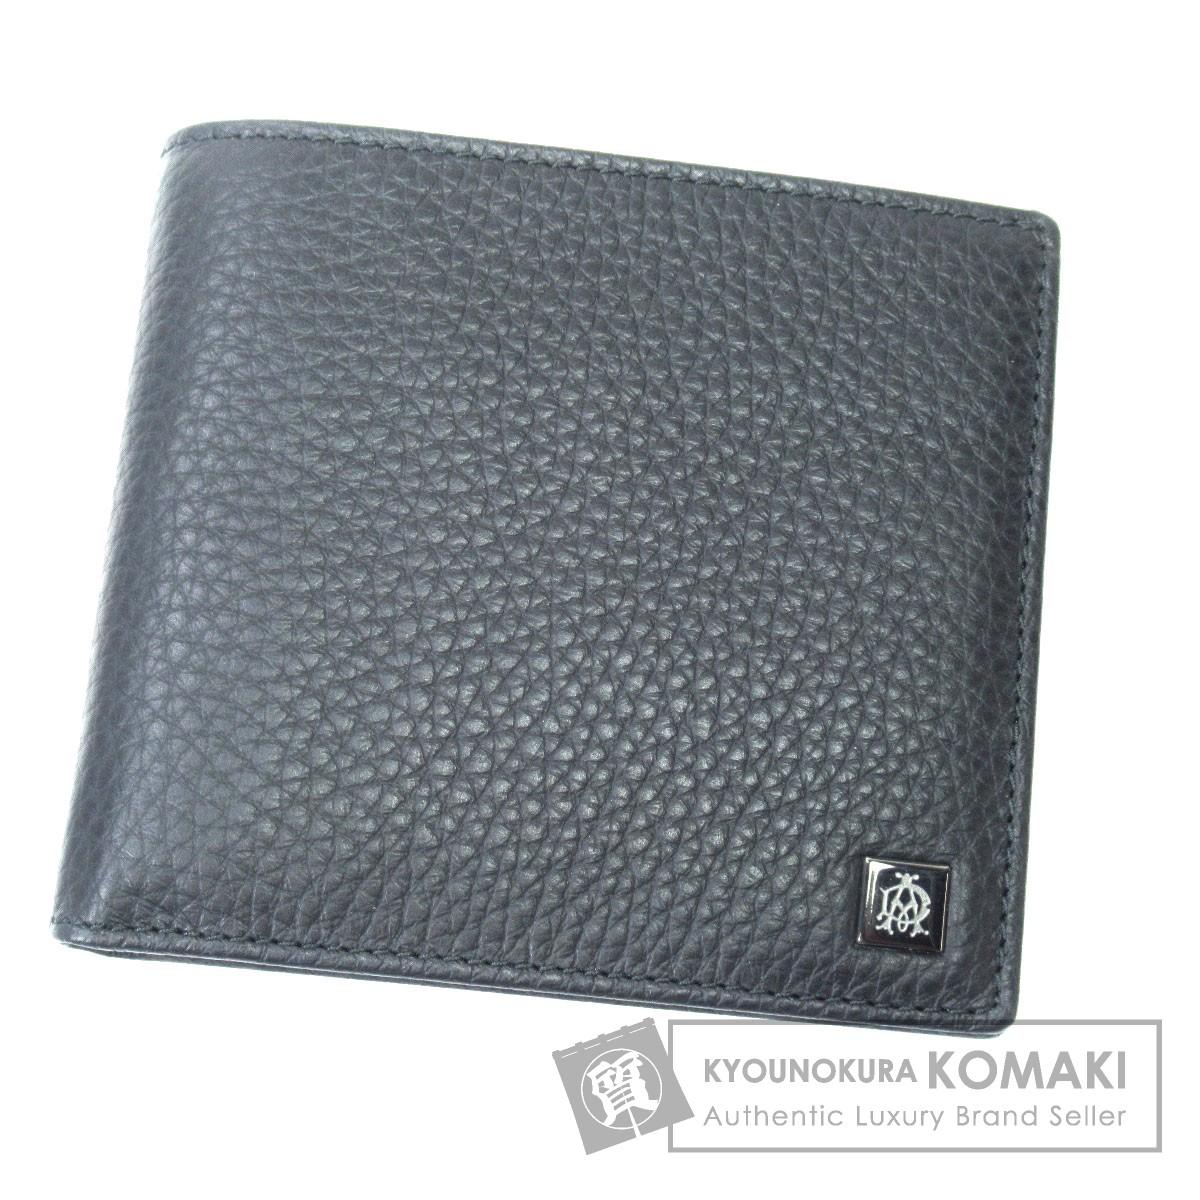 Dunhill ロゴマーク 二つ折り財布(小銭入れなし) カーフ メンズ 【中古】【ダンヒル】